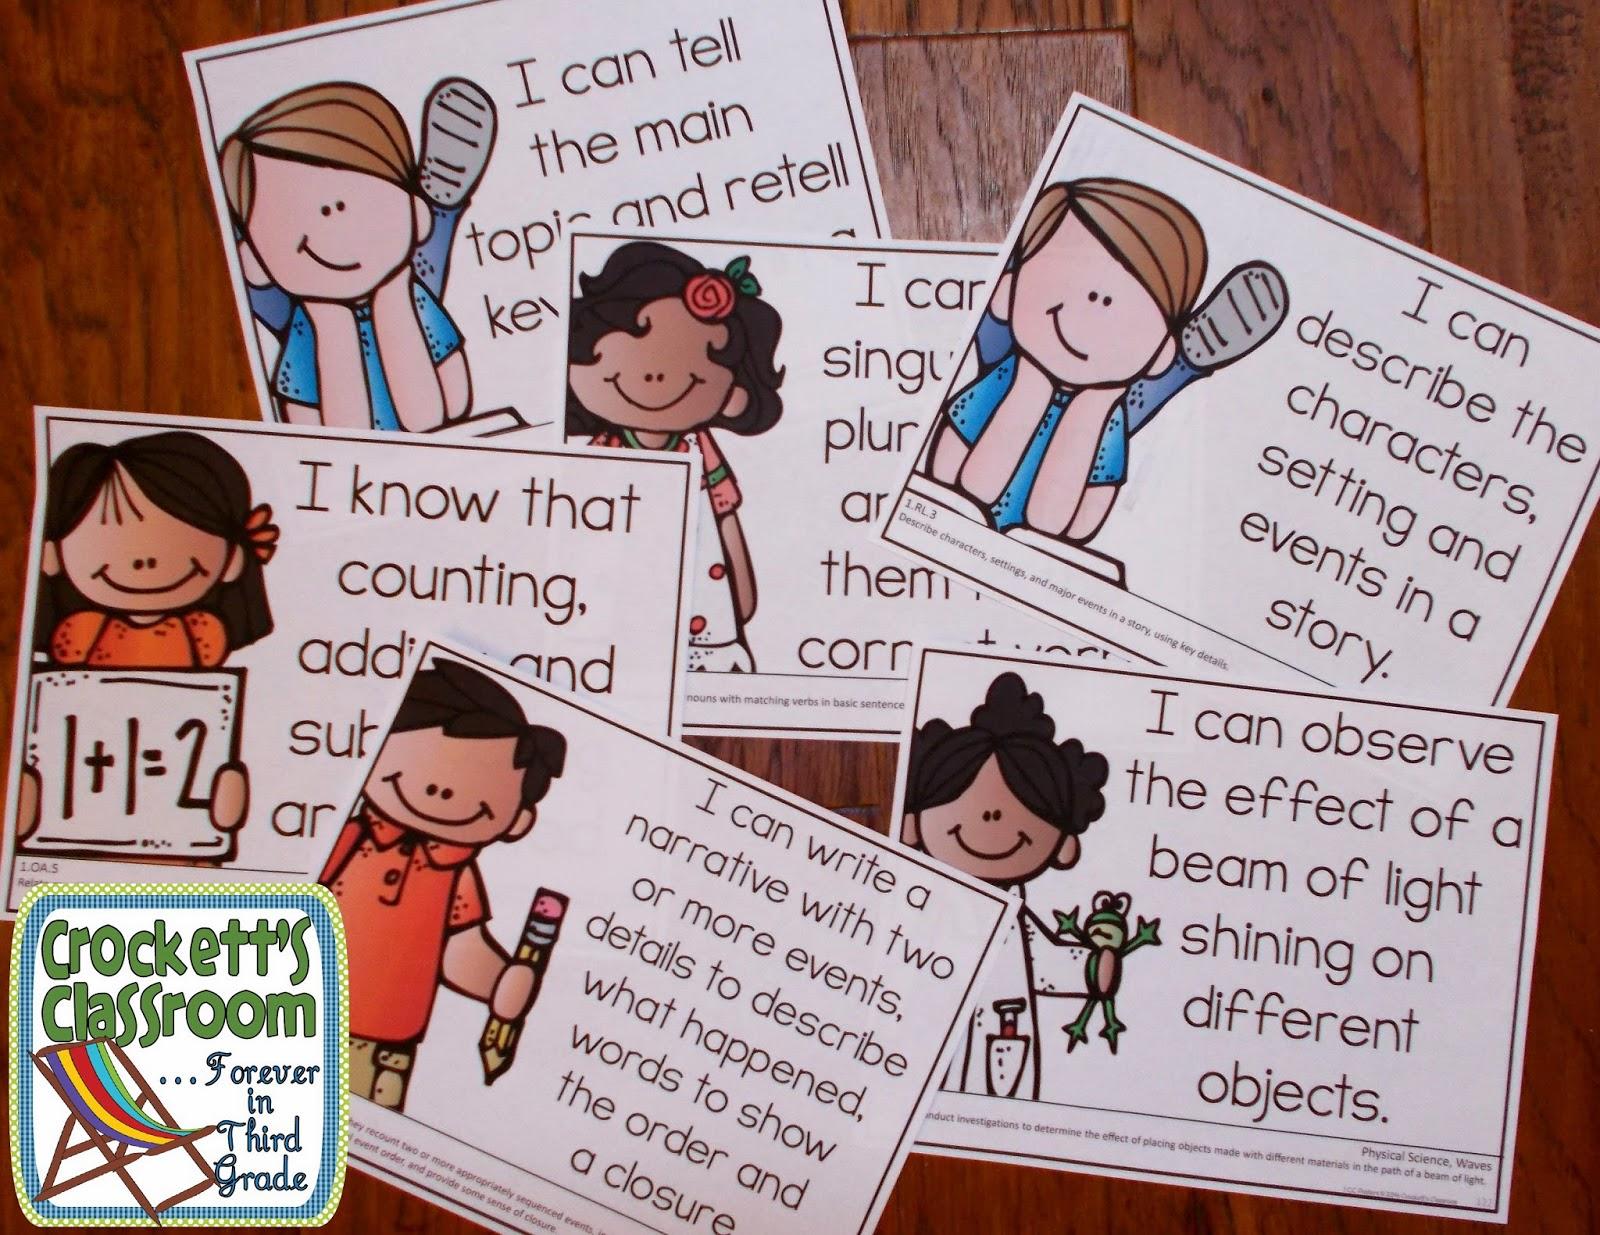 First Grade CC Posters---Crockett's Classroom